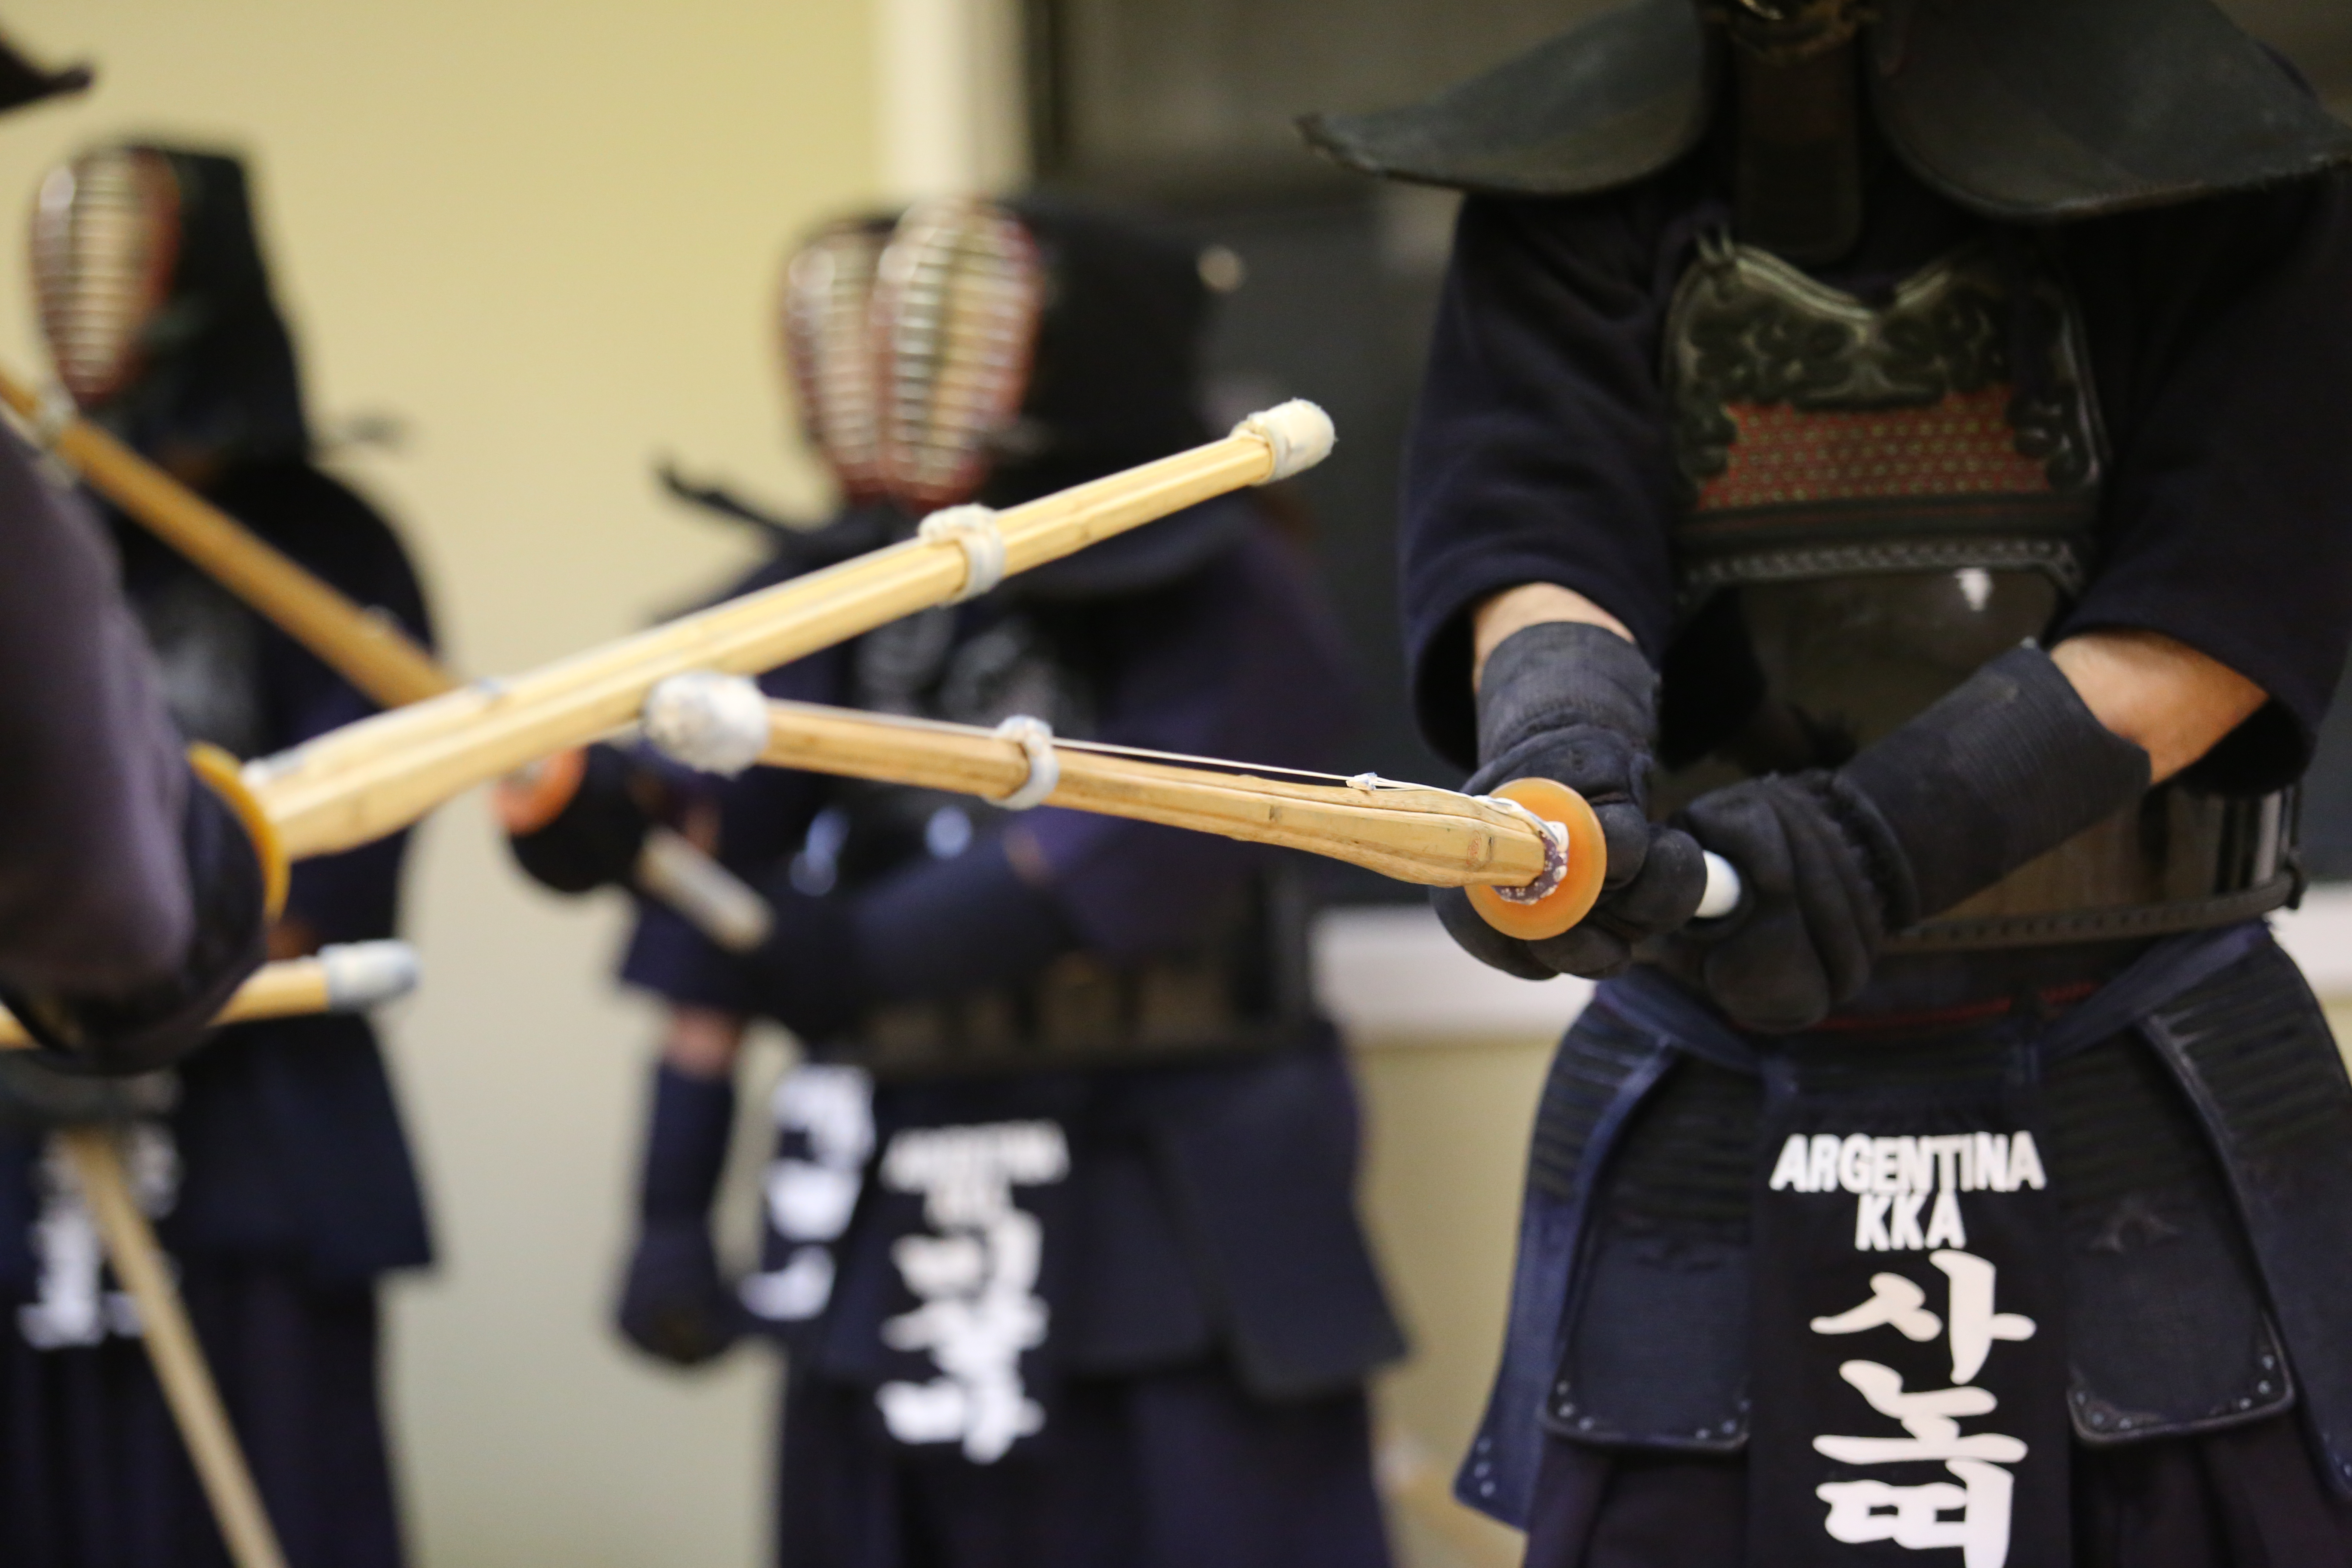 sword armor uniform HMK Kumdo Kendo